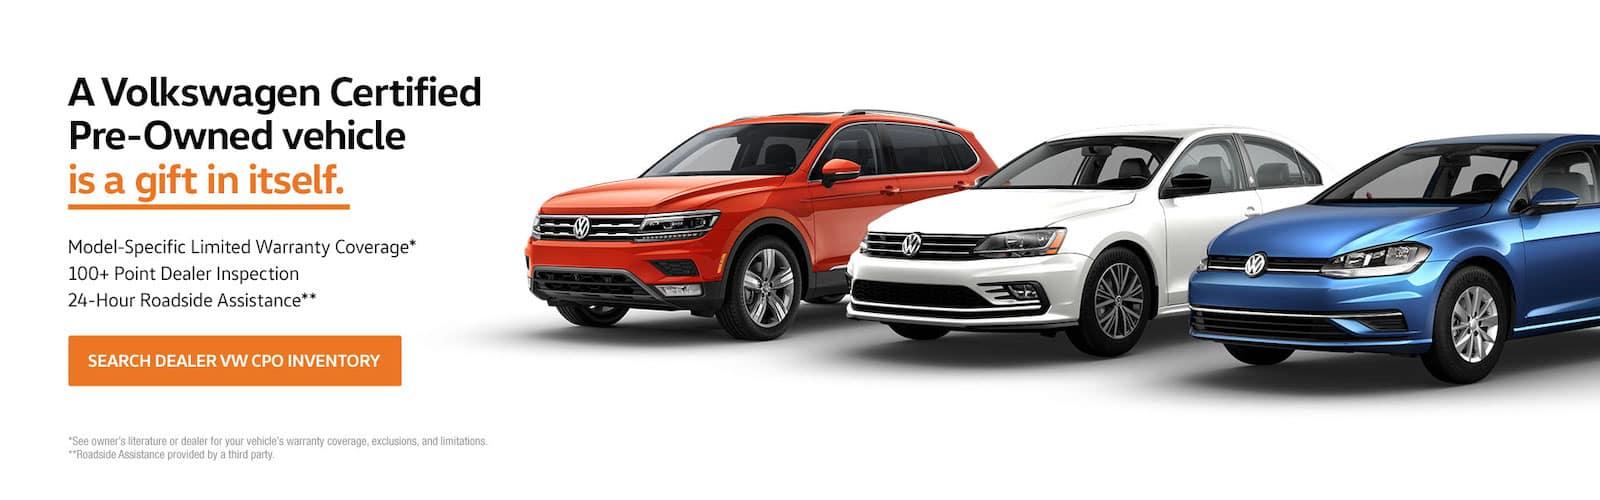 Bill Jacobs Volkswagen | Auto Dealership & Service Center in